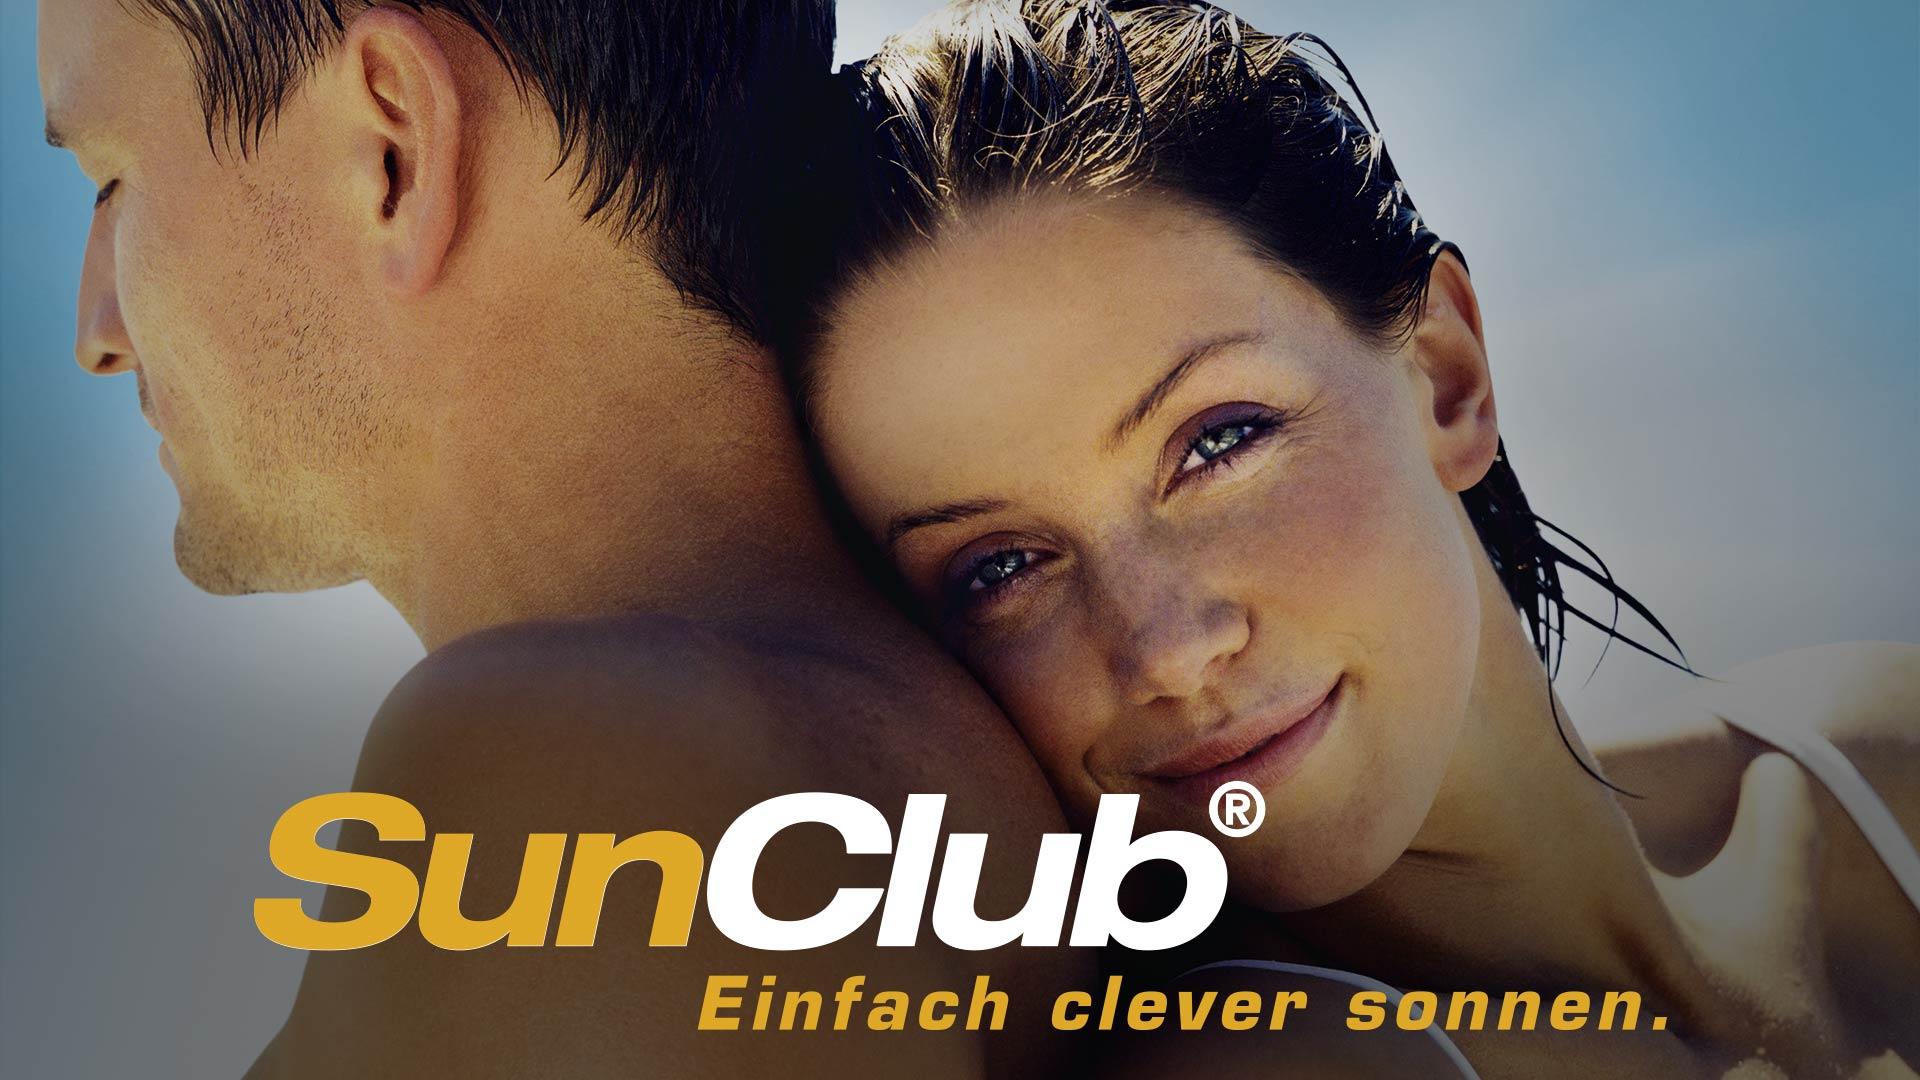 SunClub<br>Was sonst?